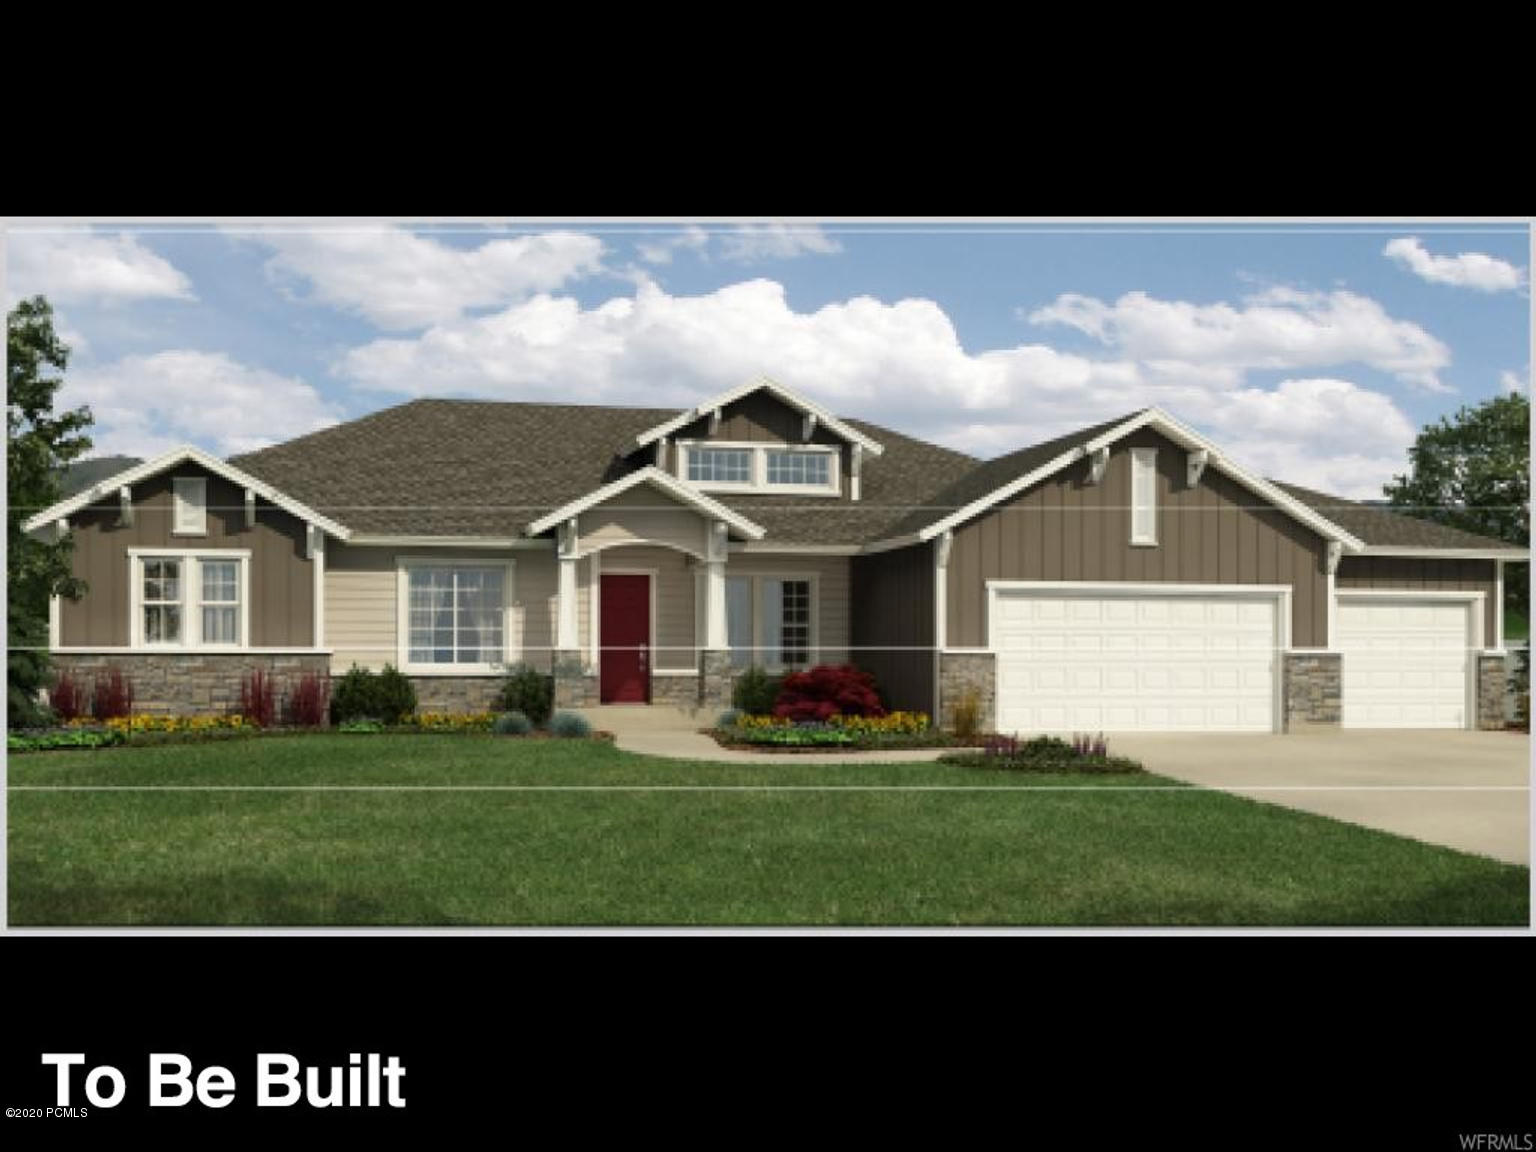 685 1490 E, Heber City, Utah 84032, 3 Bedrooms Bedrooms, ,Single Family,For Sale,1490 E,12003595